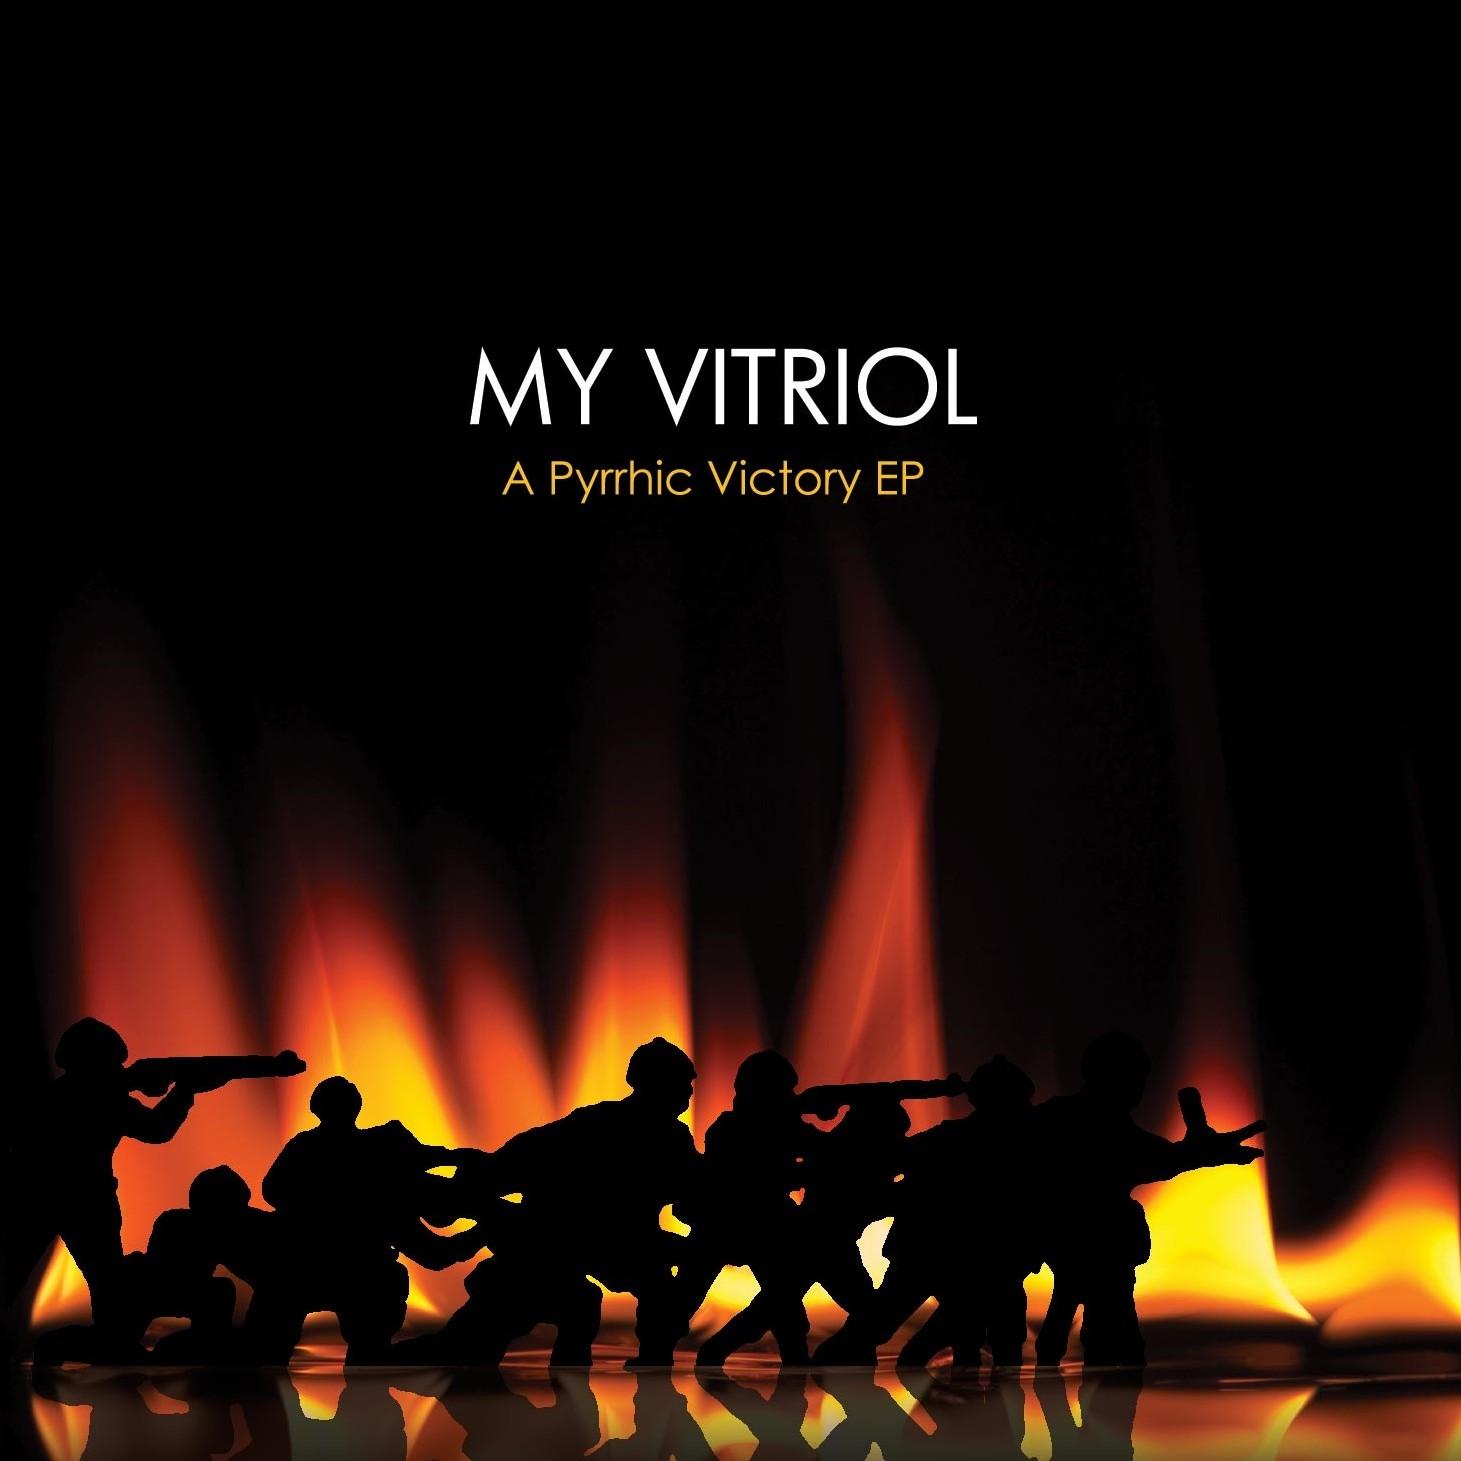 A Pyrrhic Victory EP